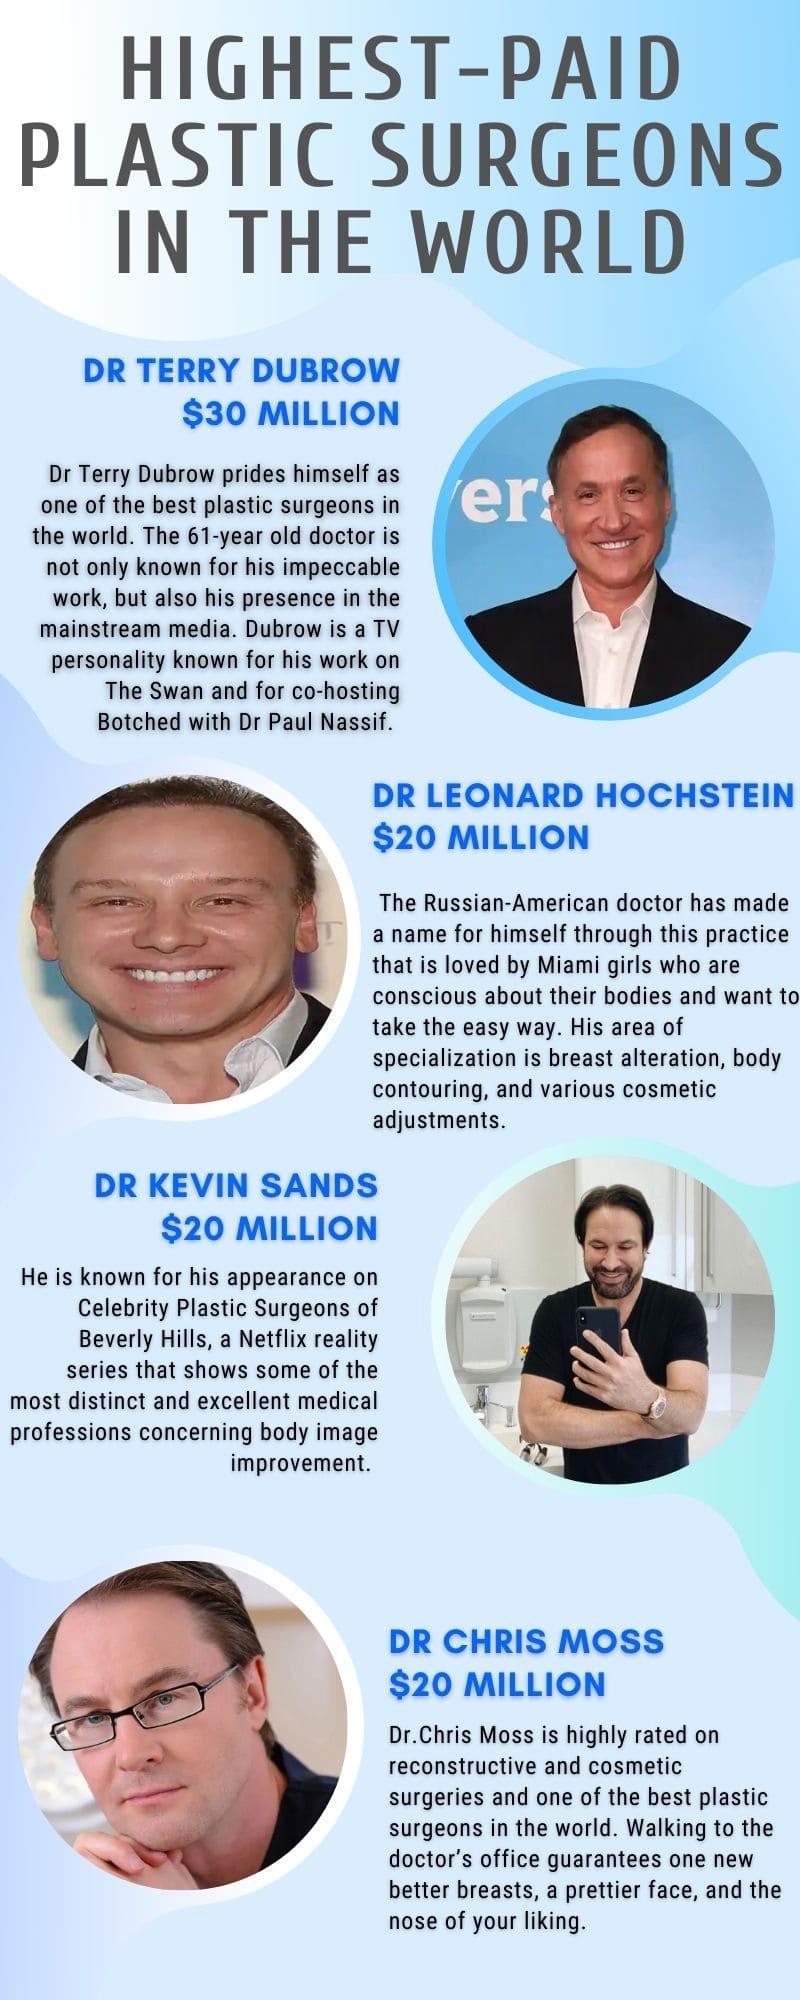 highest-paid plastic surgeons